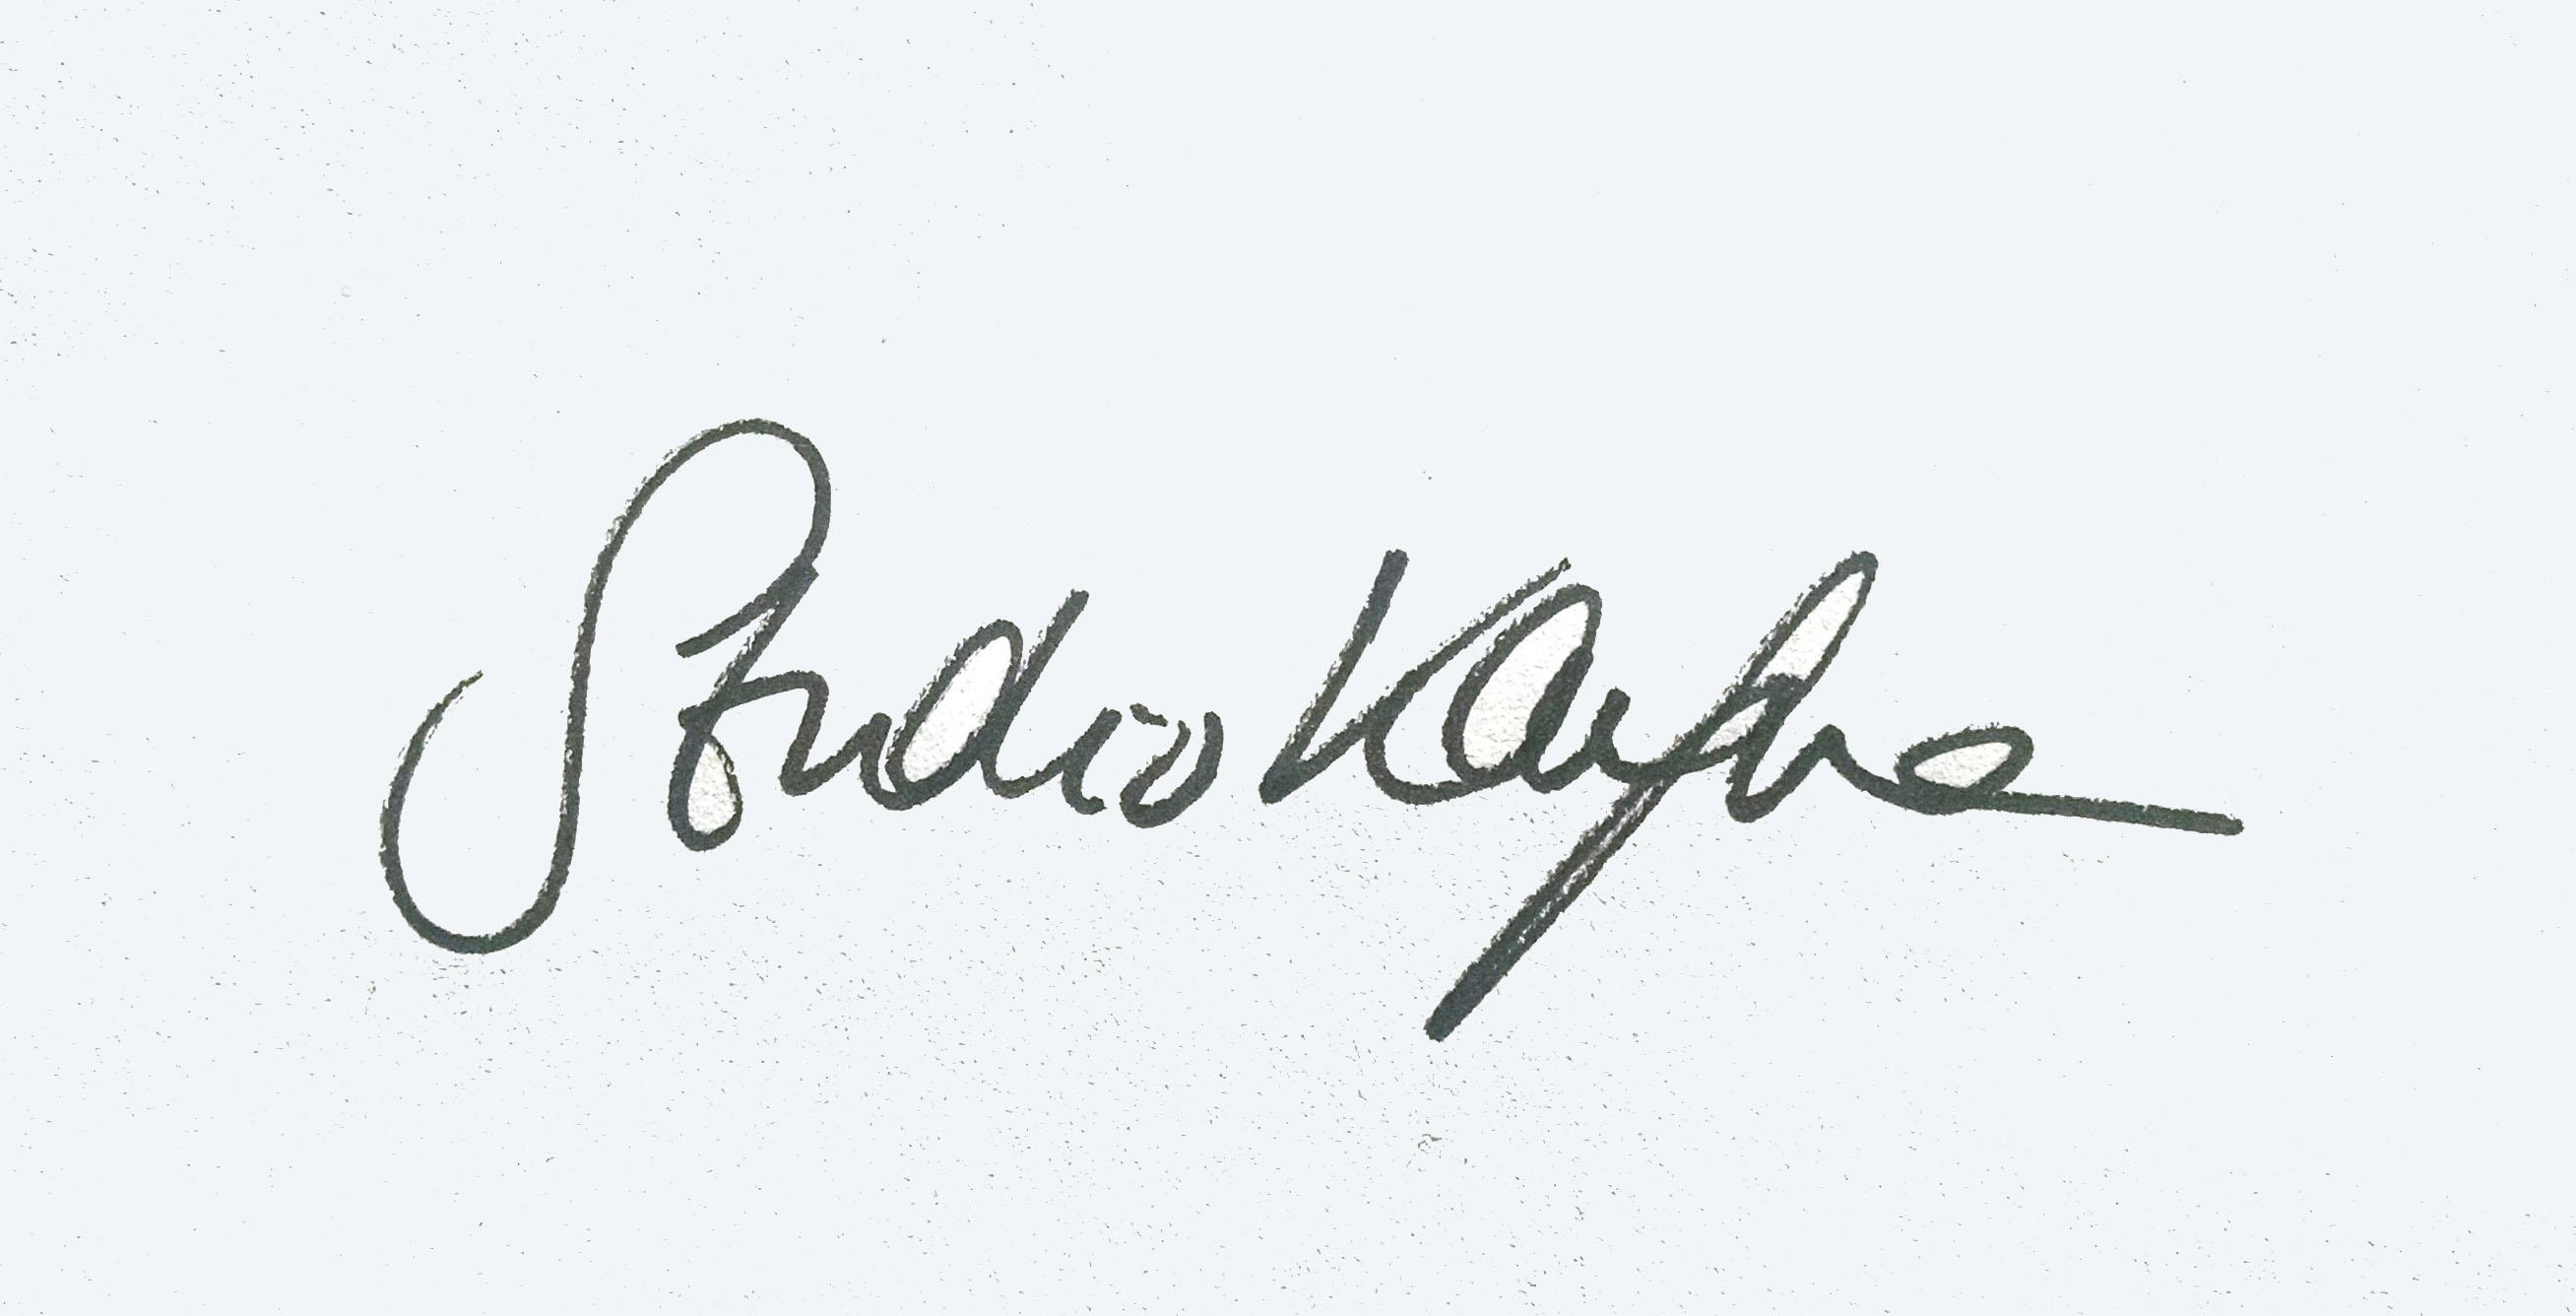 Emma Kaufmann's Signature